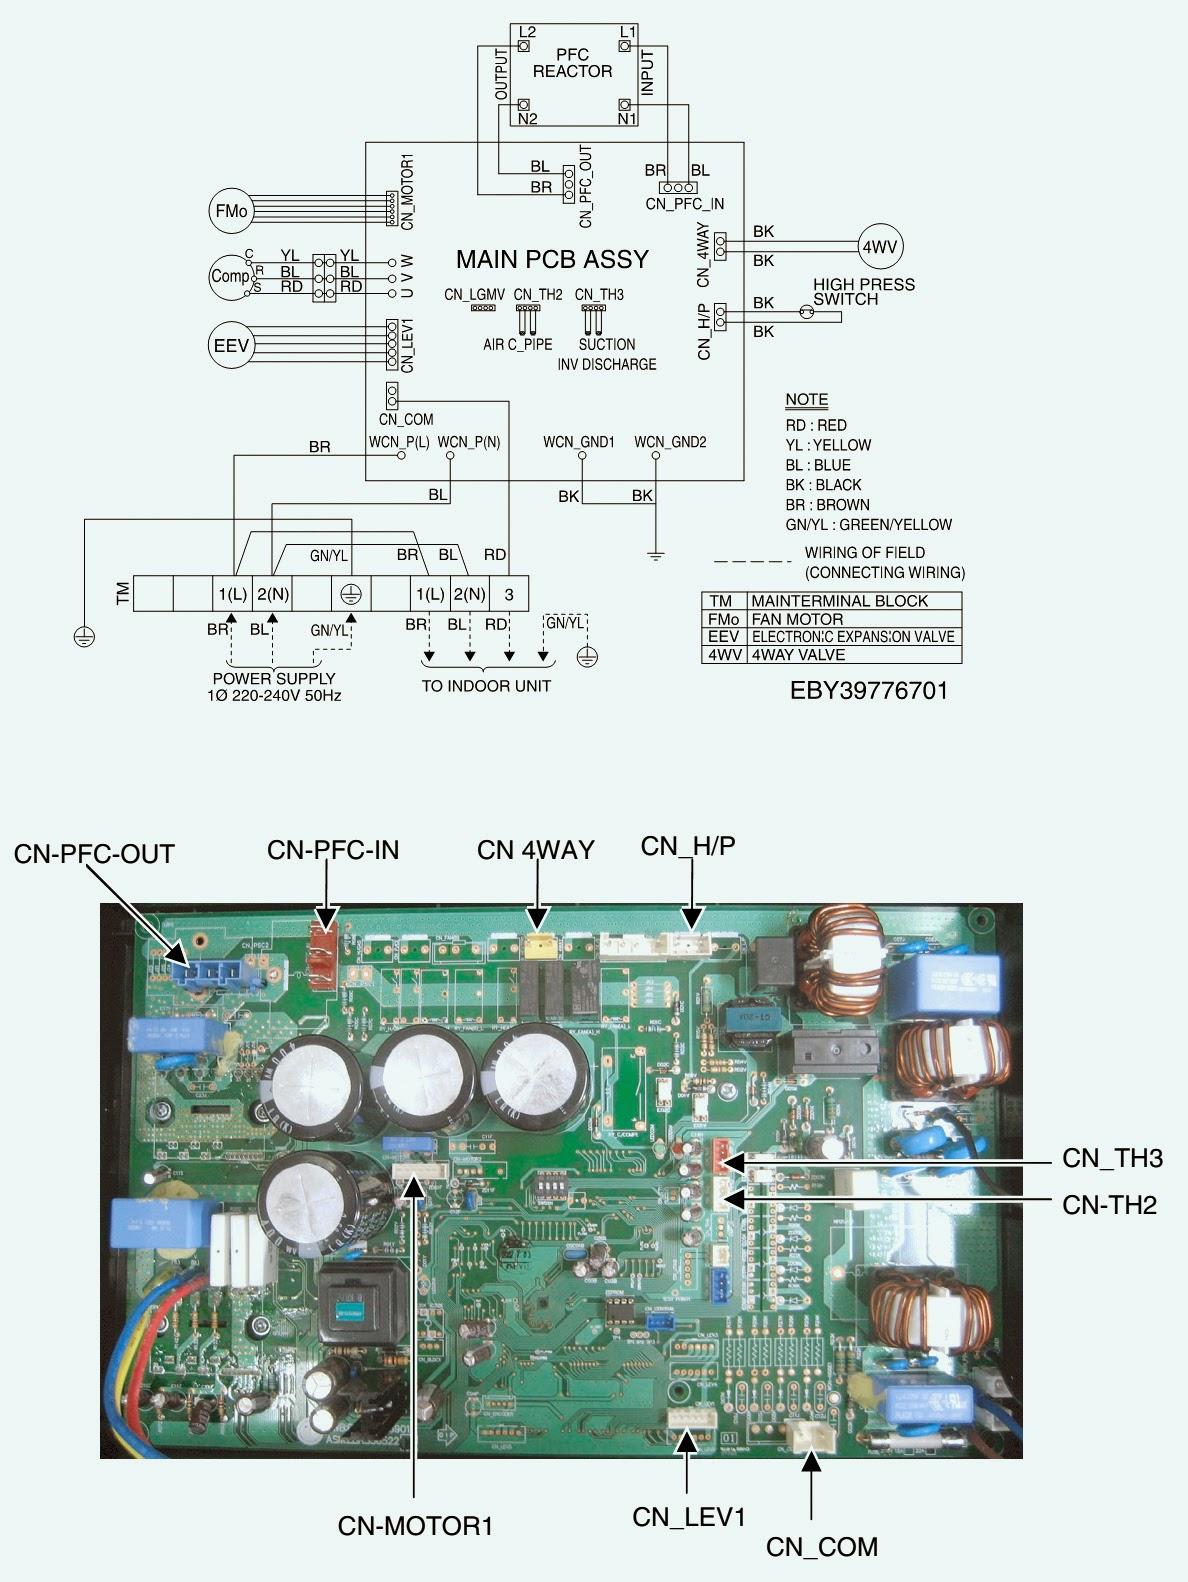 Lg Wm2010cw Wiring Diagram Data Diagrams Washing Machine Models As W096e1g0 W126e1g0 Model Manual